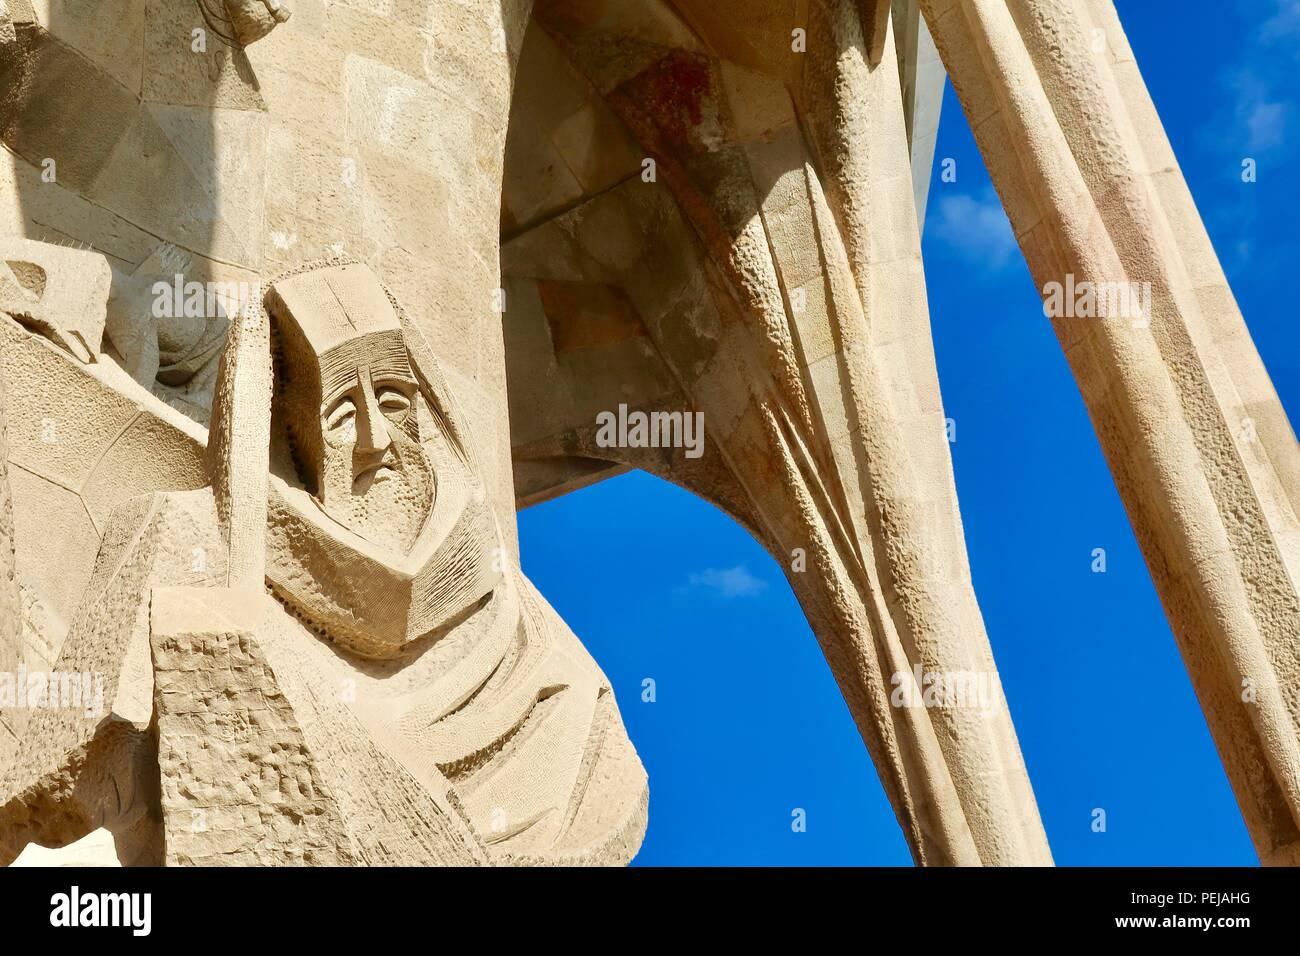 Sad man sculpture at the Sagrada Familia by Gaudi. Barcelona, Spain. Hot summer day August 2018. - Stock Image